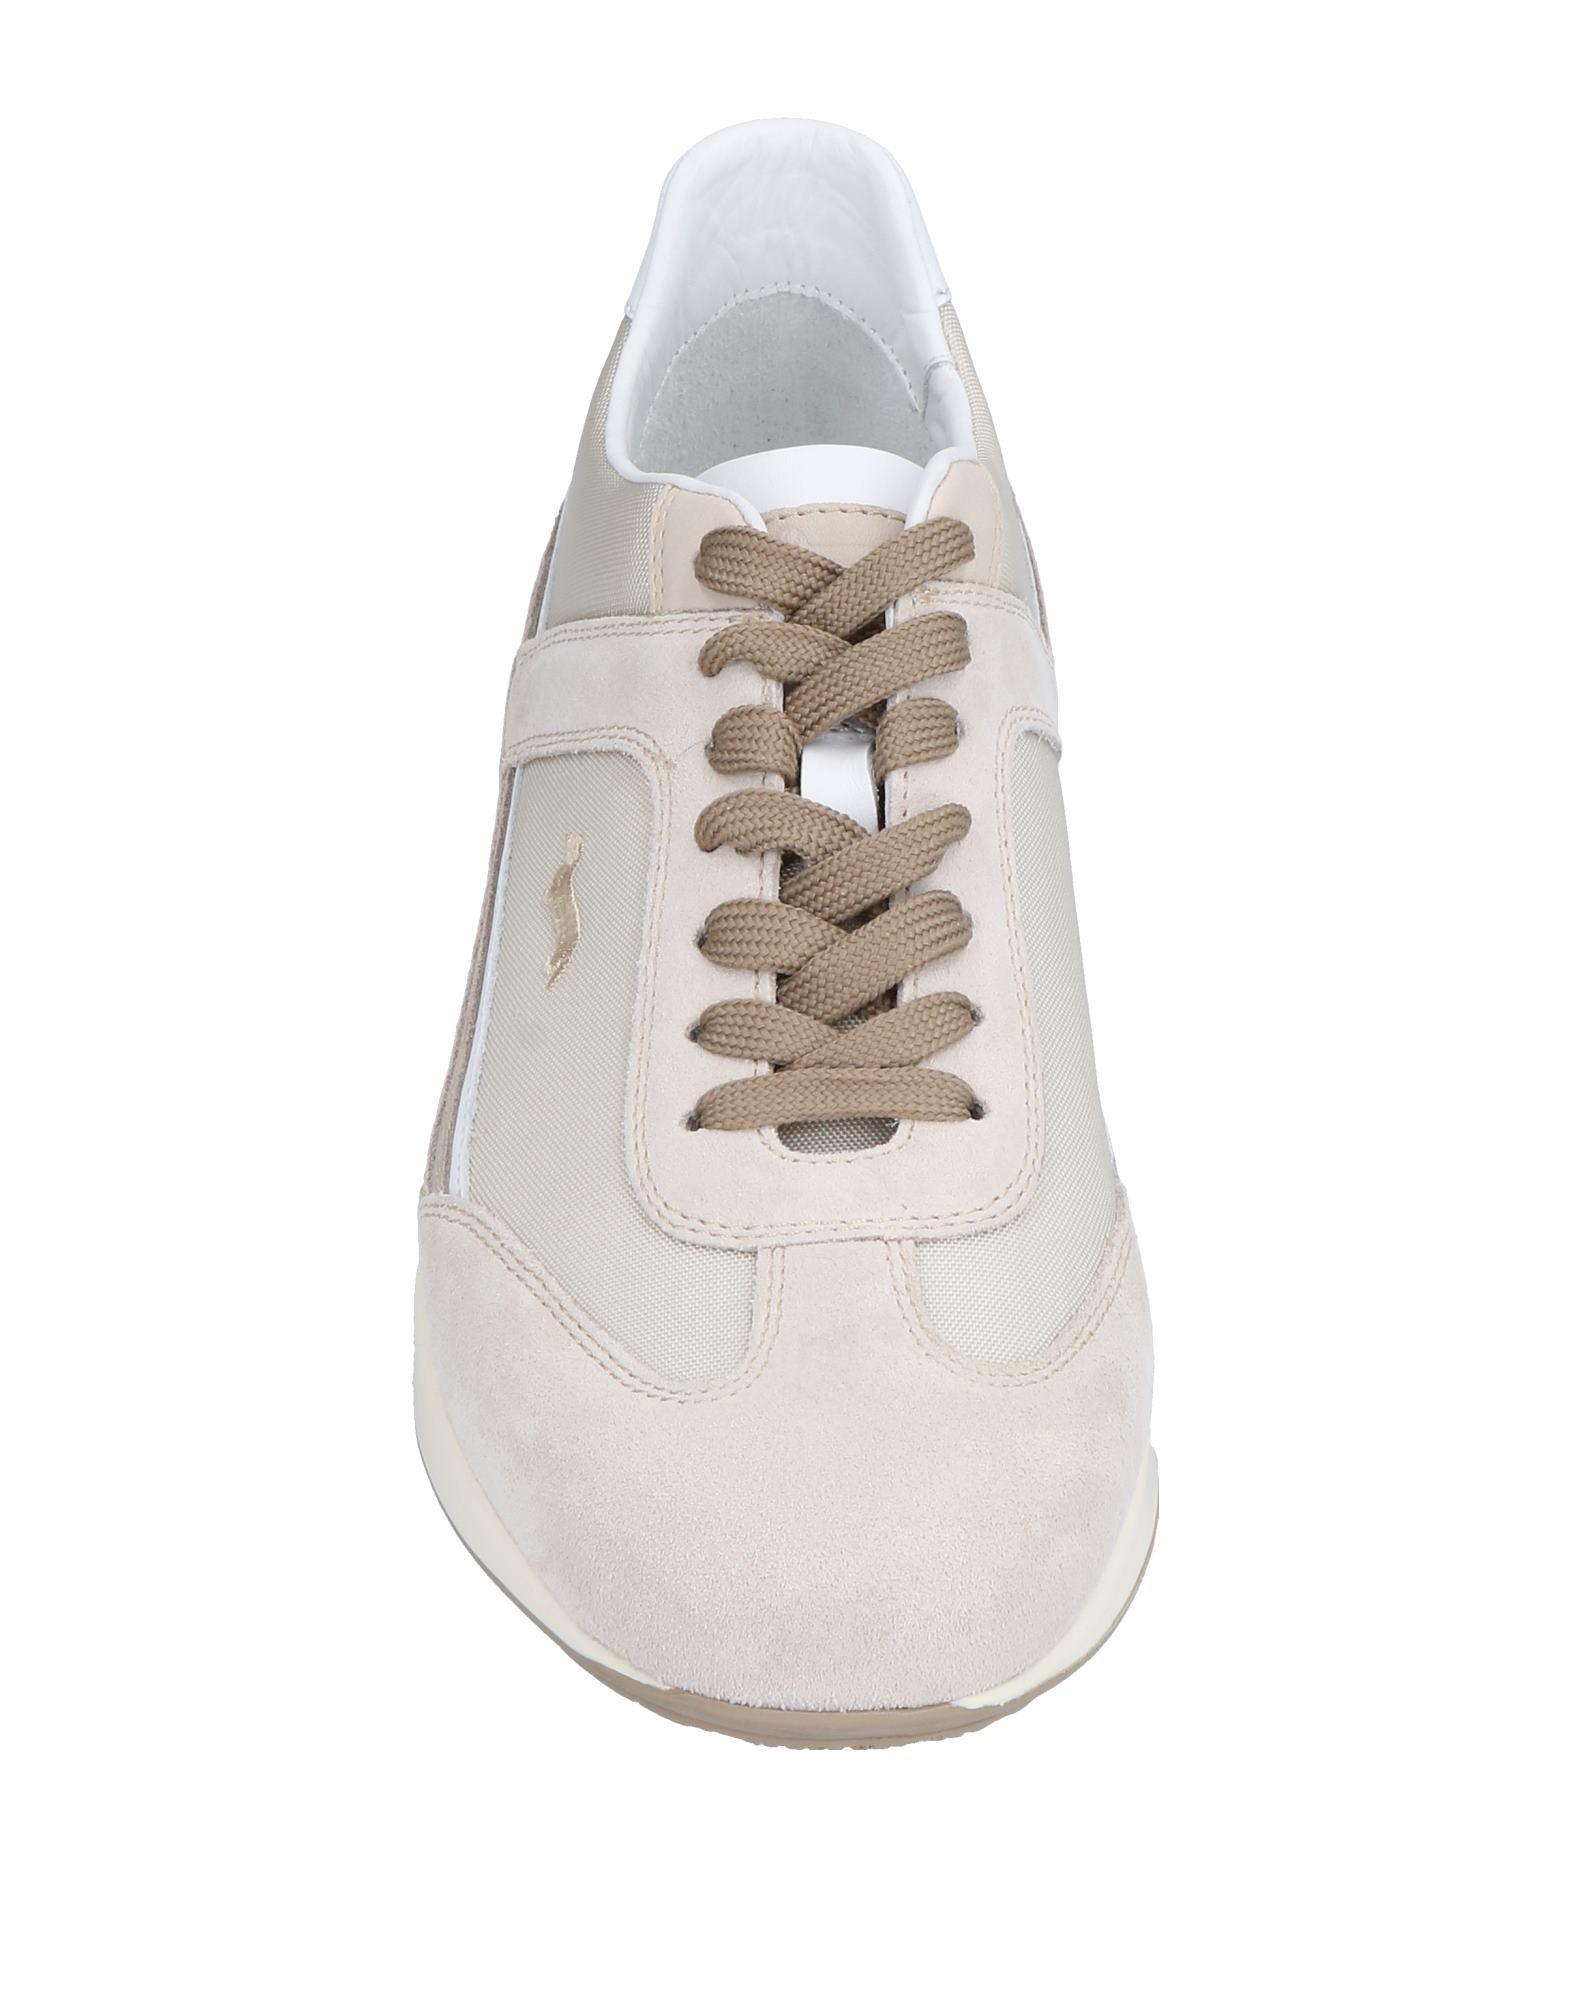 Harmont&Blaine Harmont&Blaine  Sneakers Herren  11501896AG a6f57c